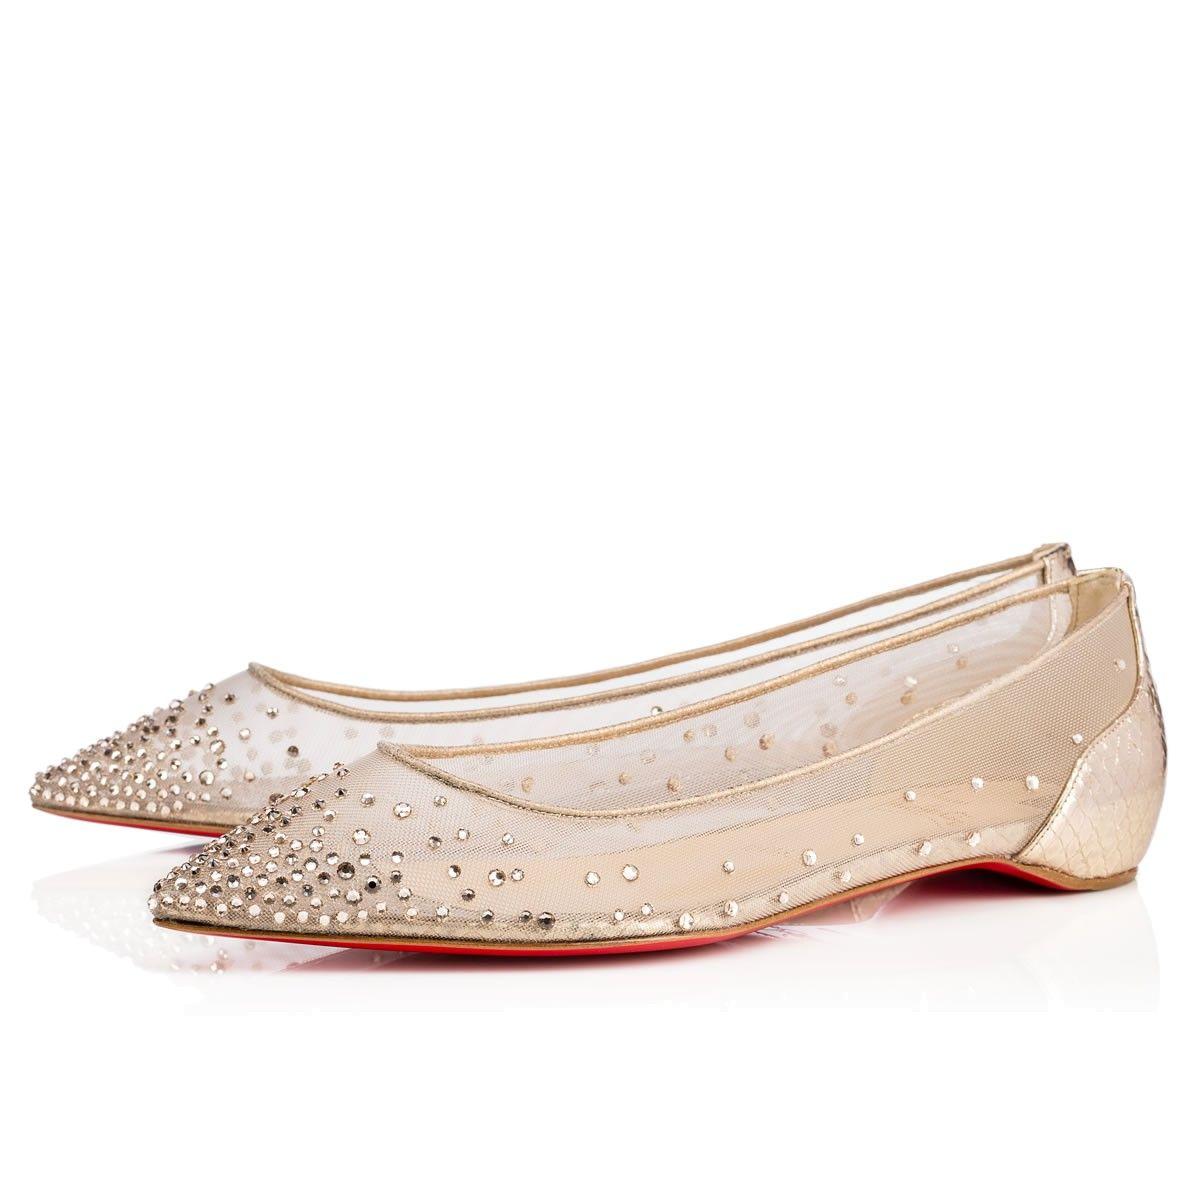 96d324fc5b1 Shoes - Follies Strass Flat - Christian Louboutin